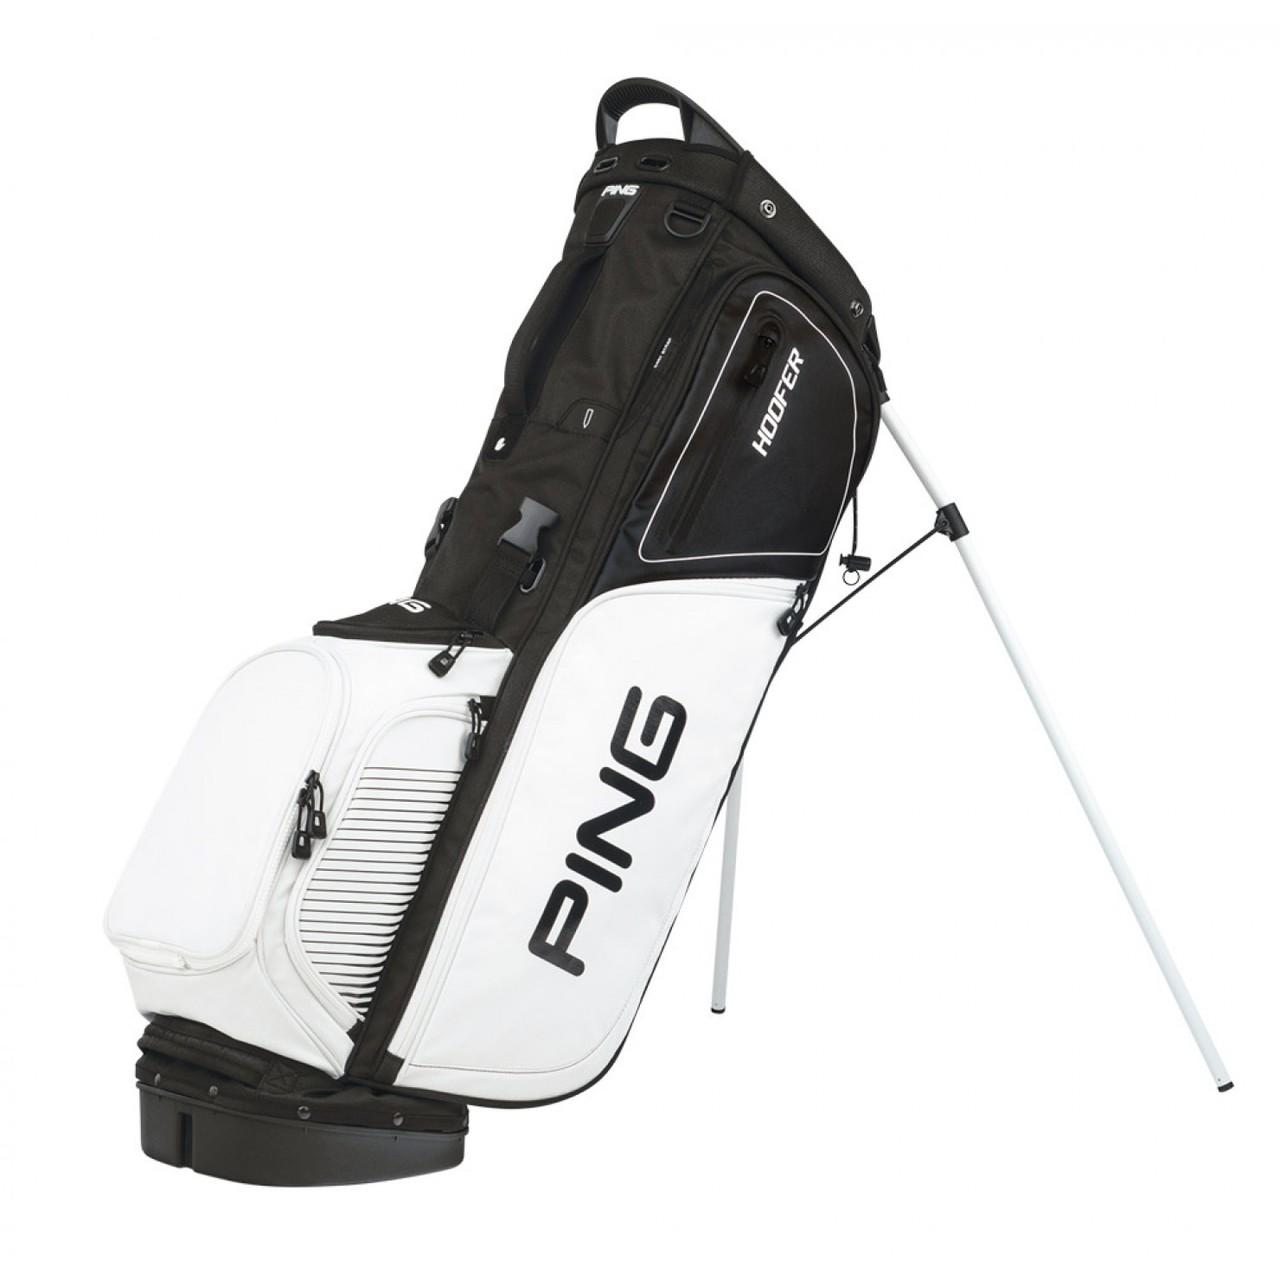 70c2d45b3ef7 PING Hoofer Golf Stand Bag - Black White